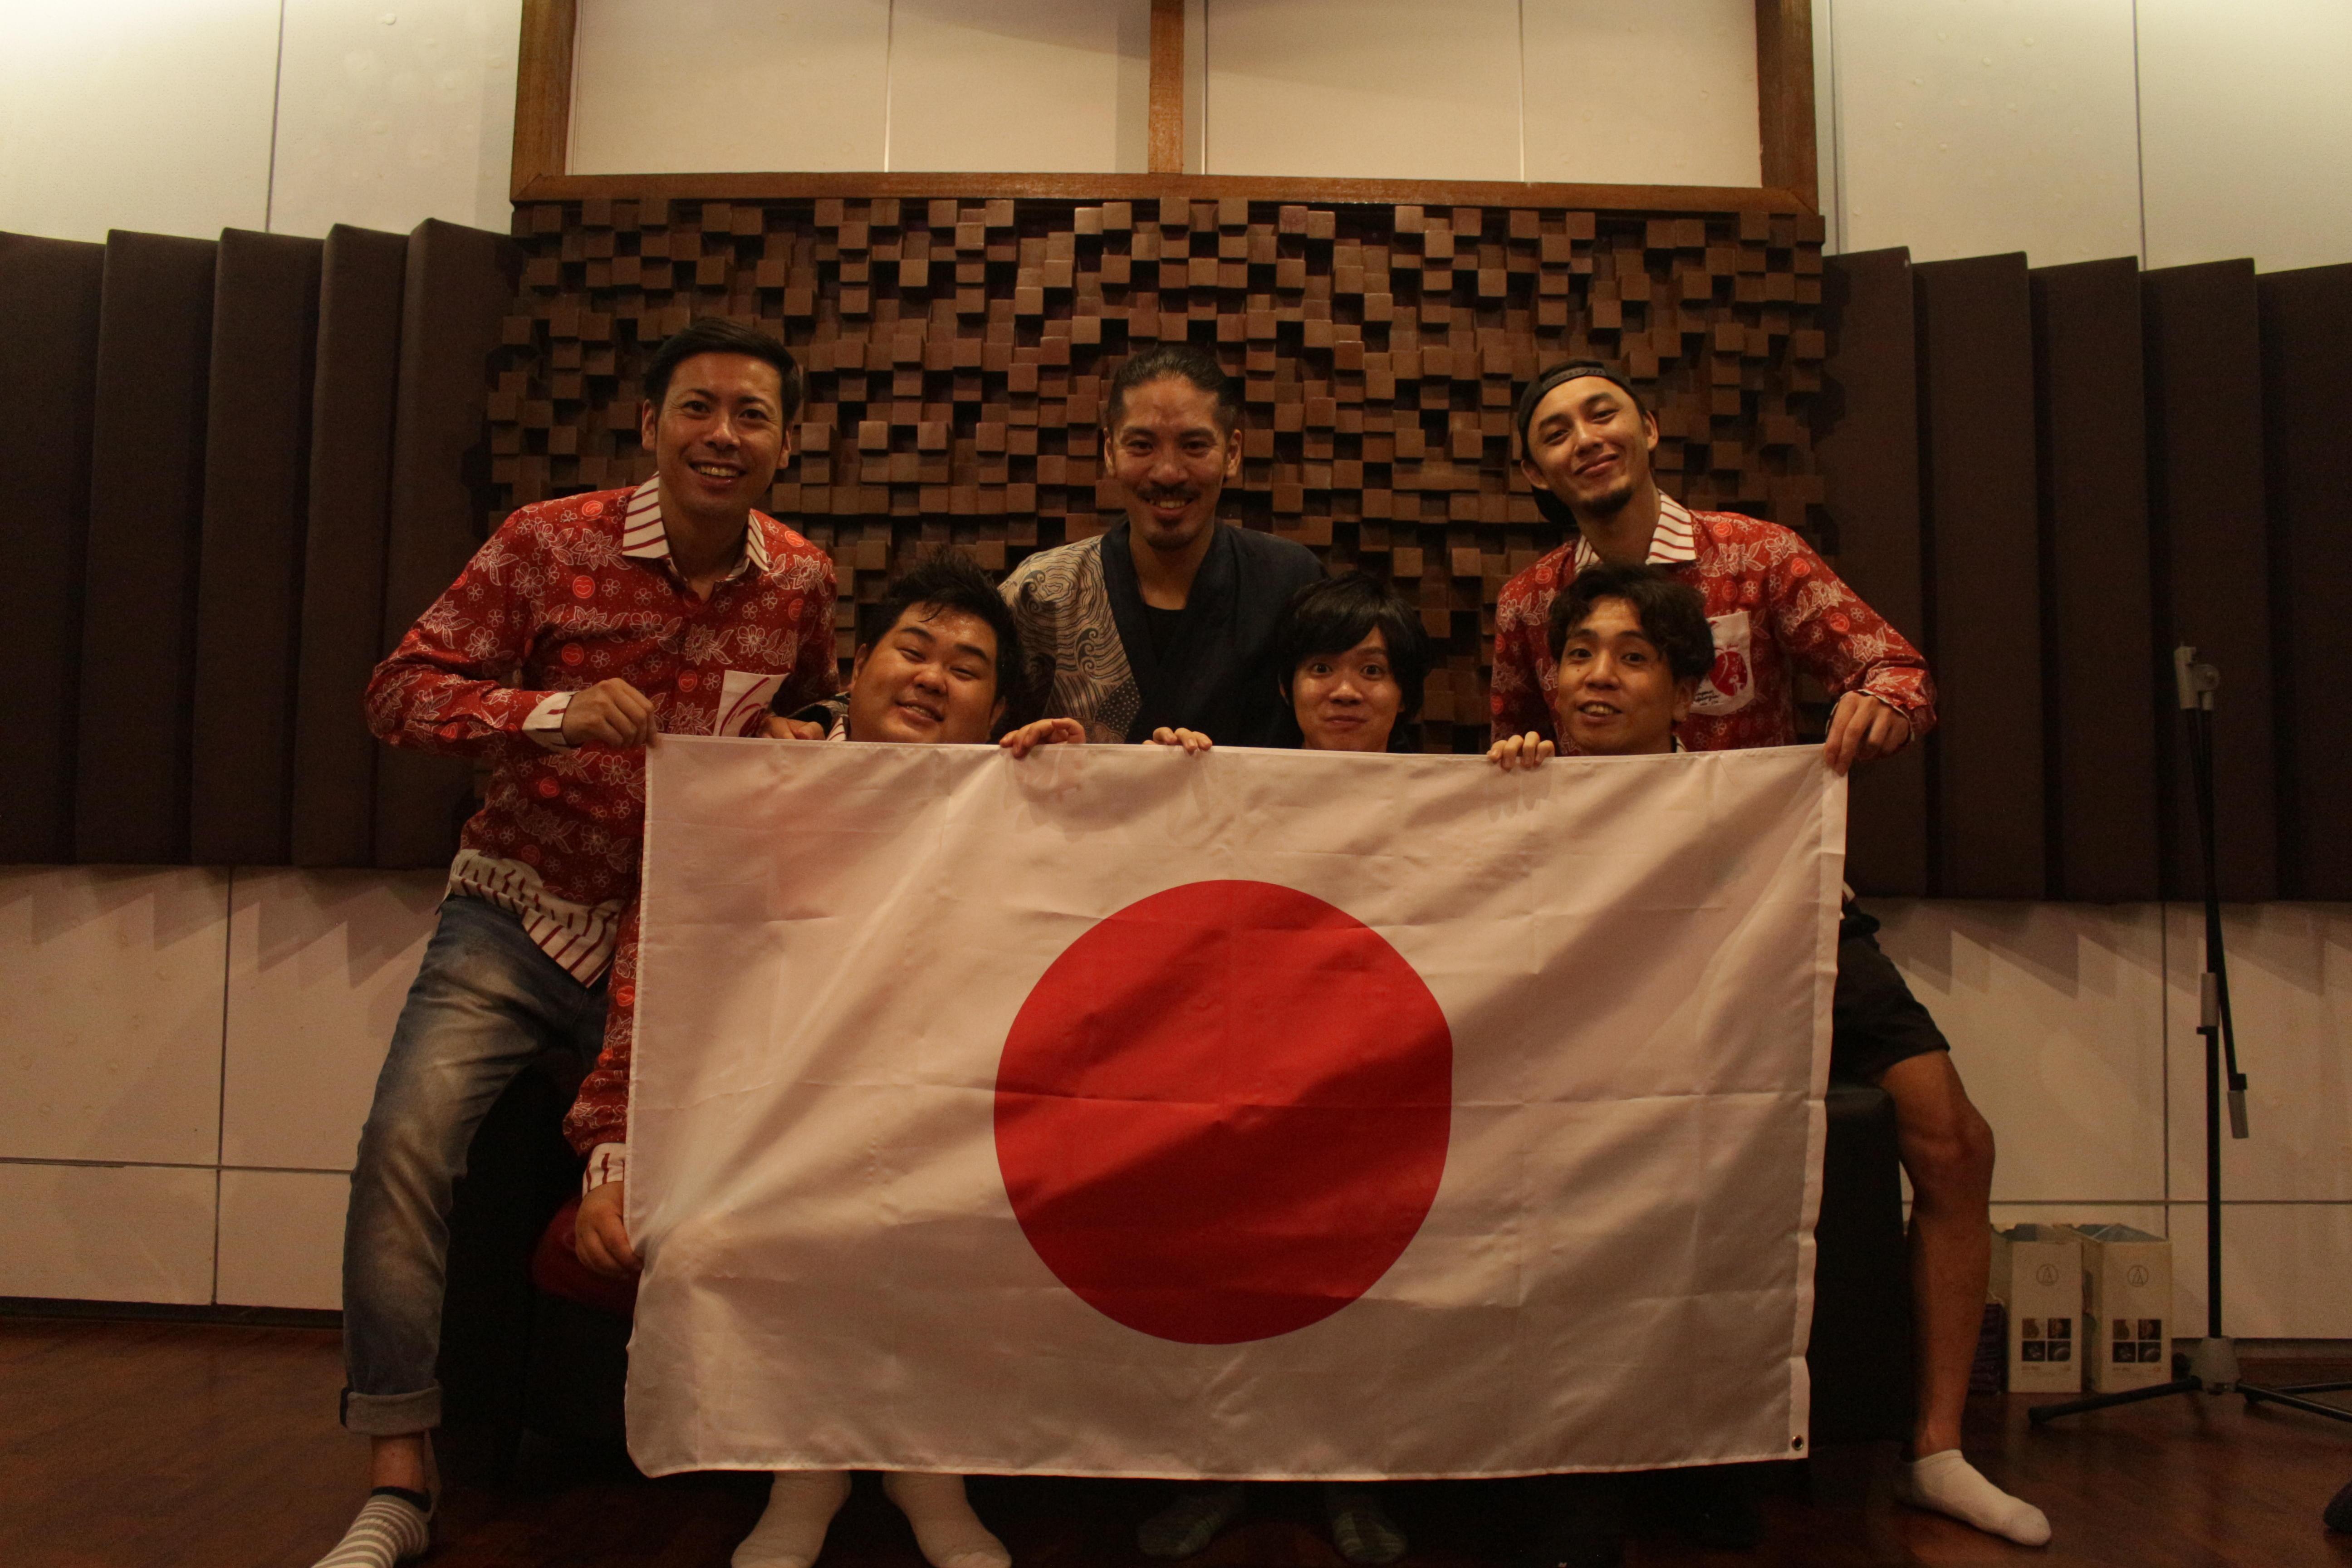 http://news.yoshimoto.co.jp/20180724193007-5764f19135b2b9fbd87ac525df0f35ebf310a5d3.jpg